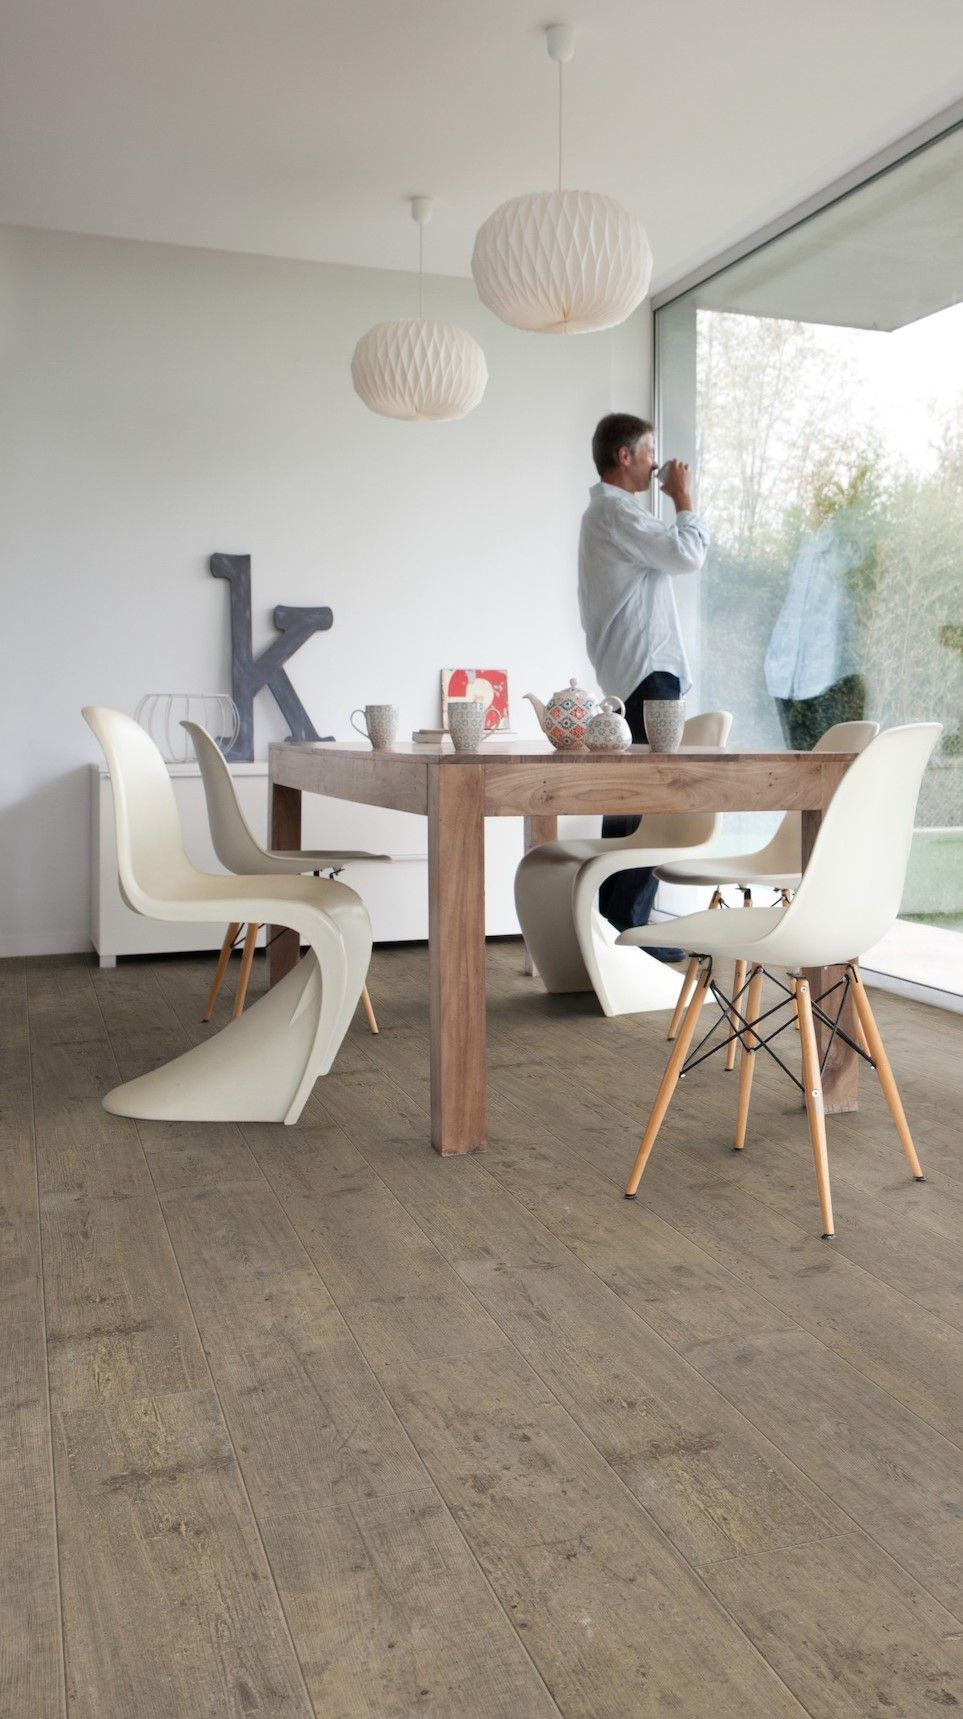 Pvc vloer Home Stick - Lugano screed XL: Zelfklevende pvc vloer. Pvc ...